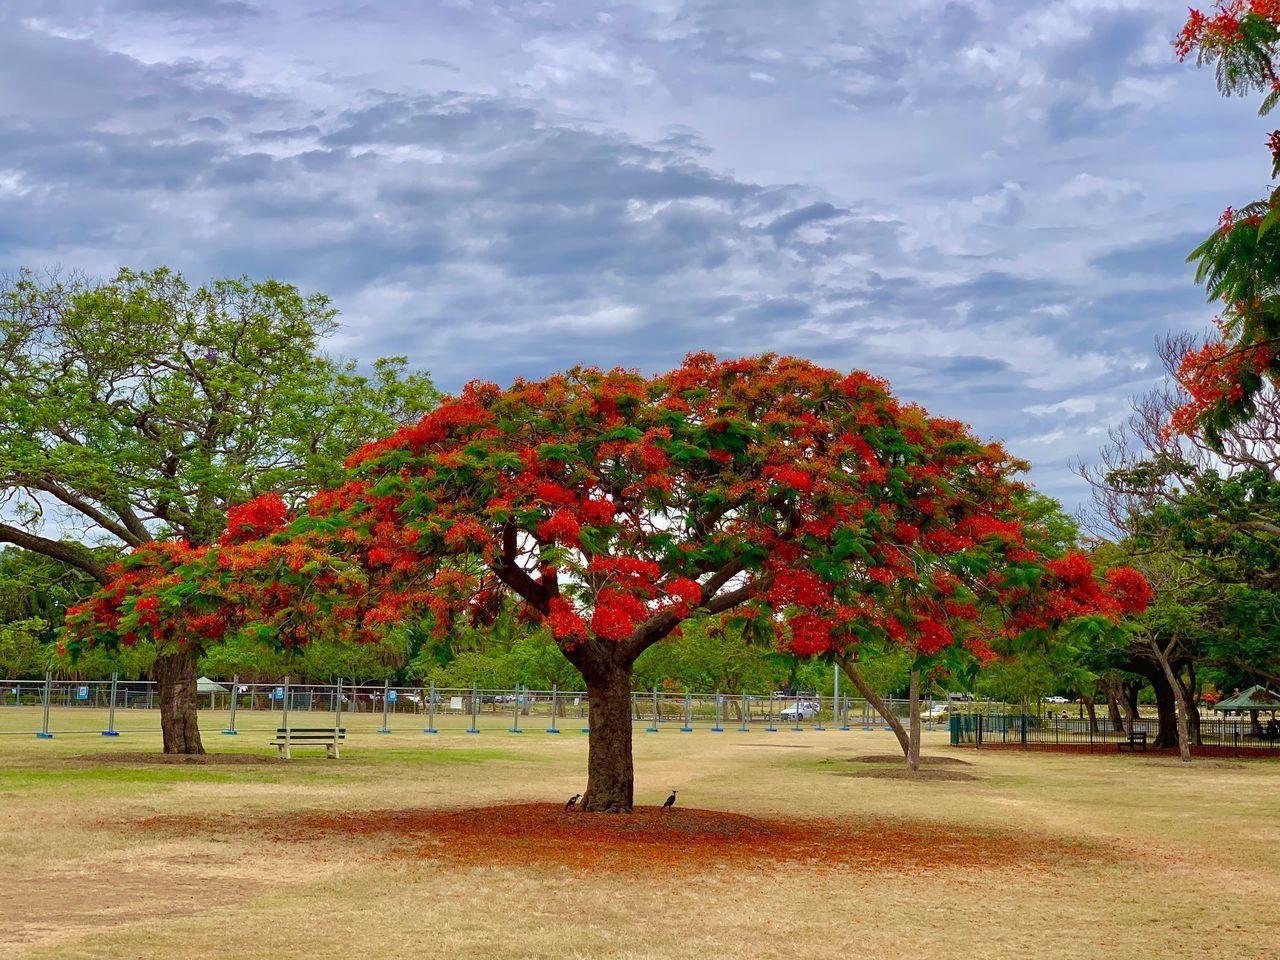 AUTUMN TREES IN PARK AGAINST SKY